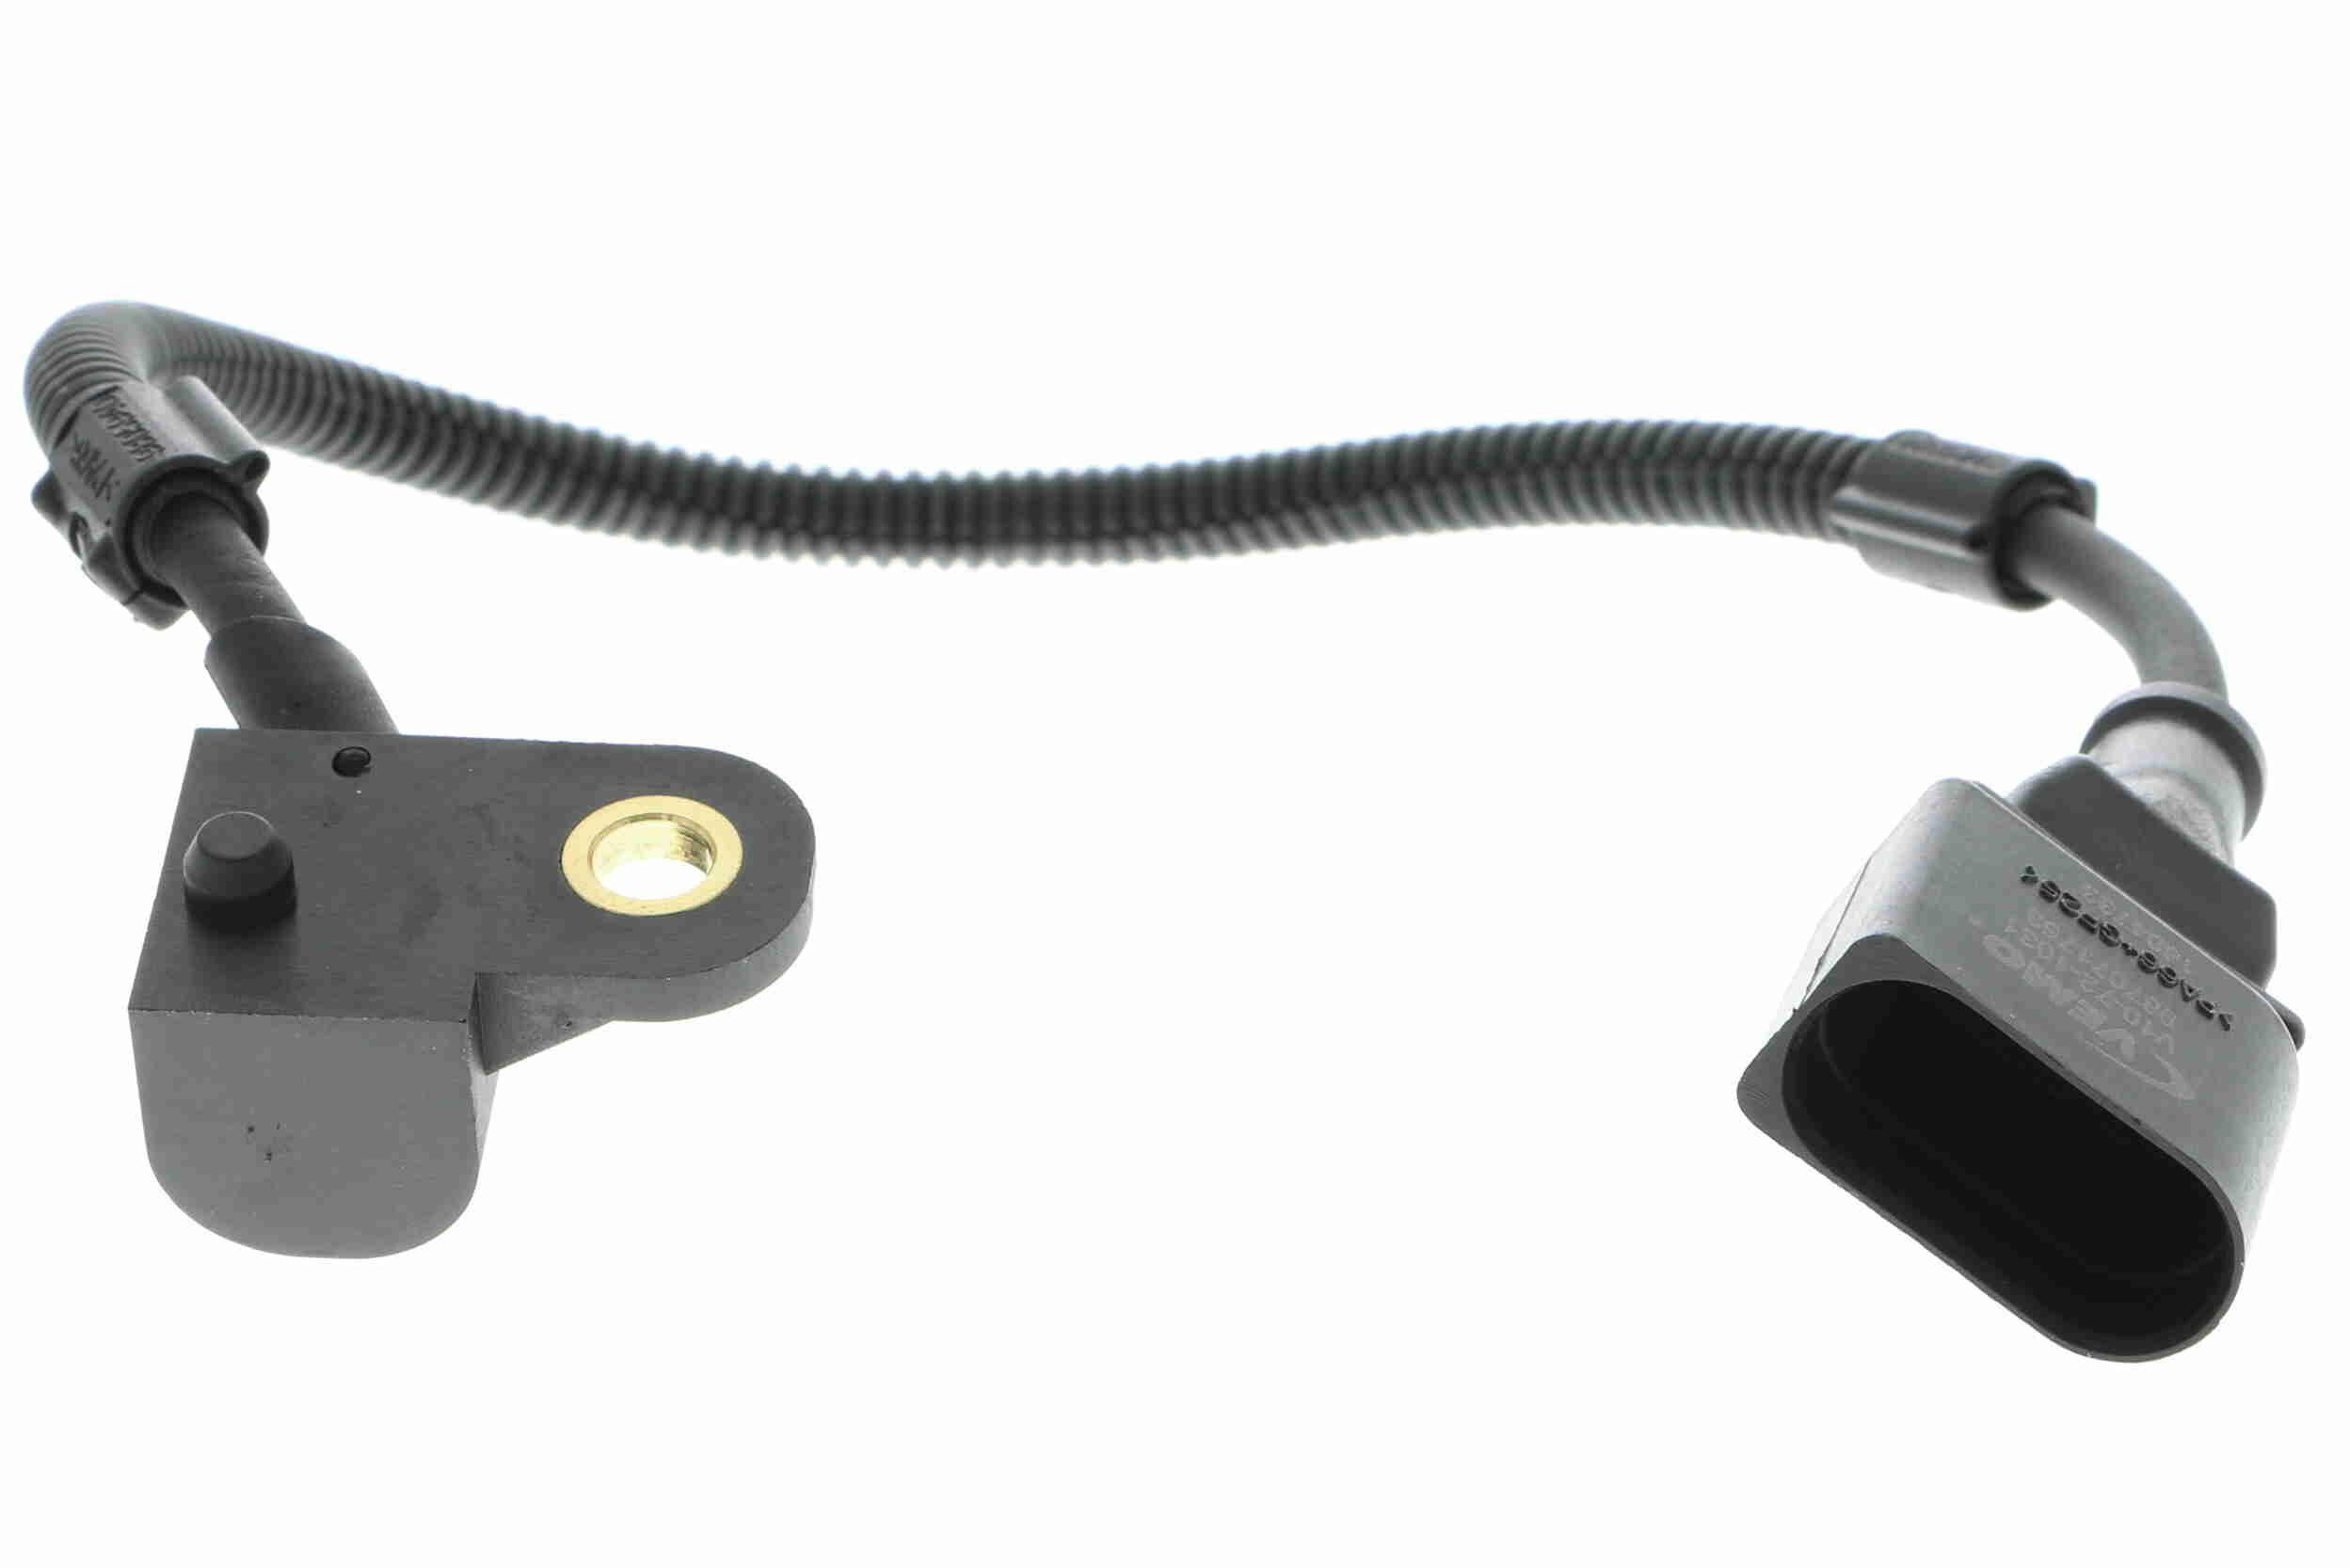 Sensor, kamaxelposition VEMO V10-72-1031 Recensioner